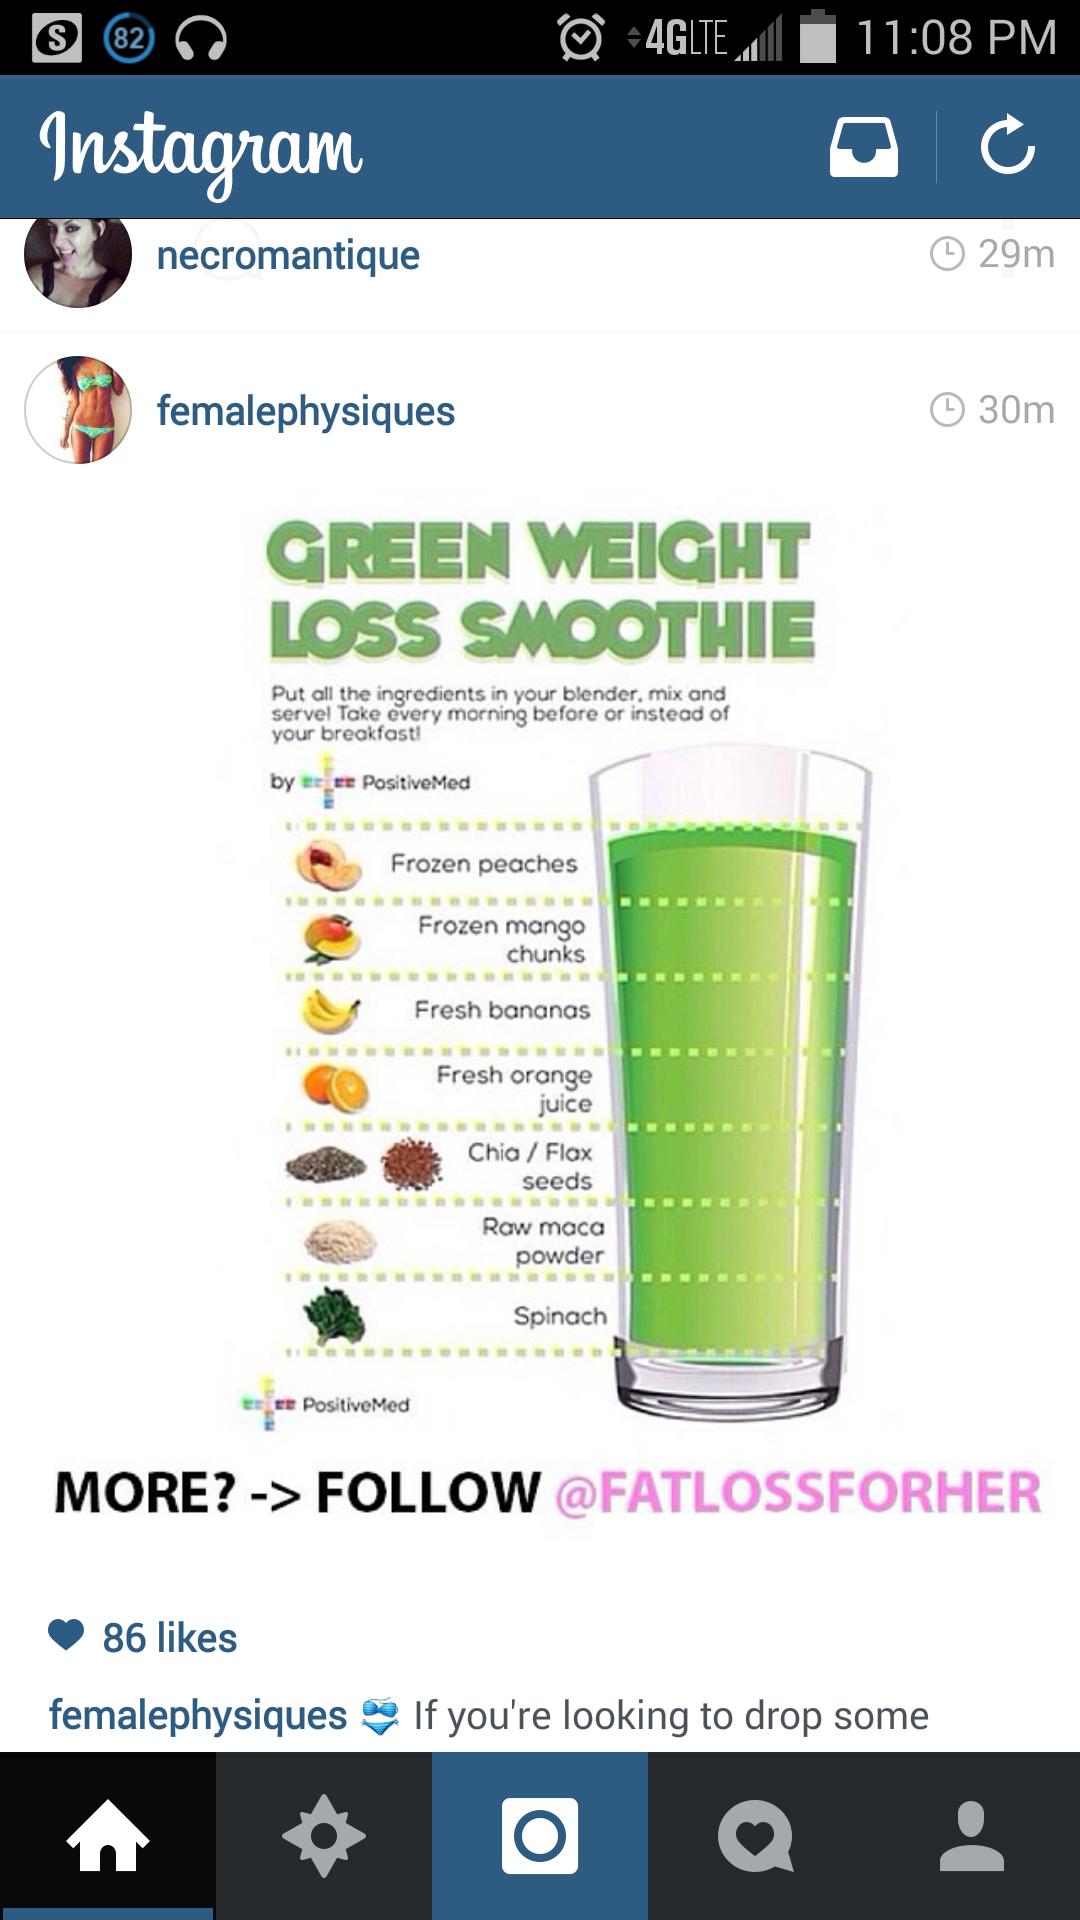 Juices - Magazine cover